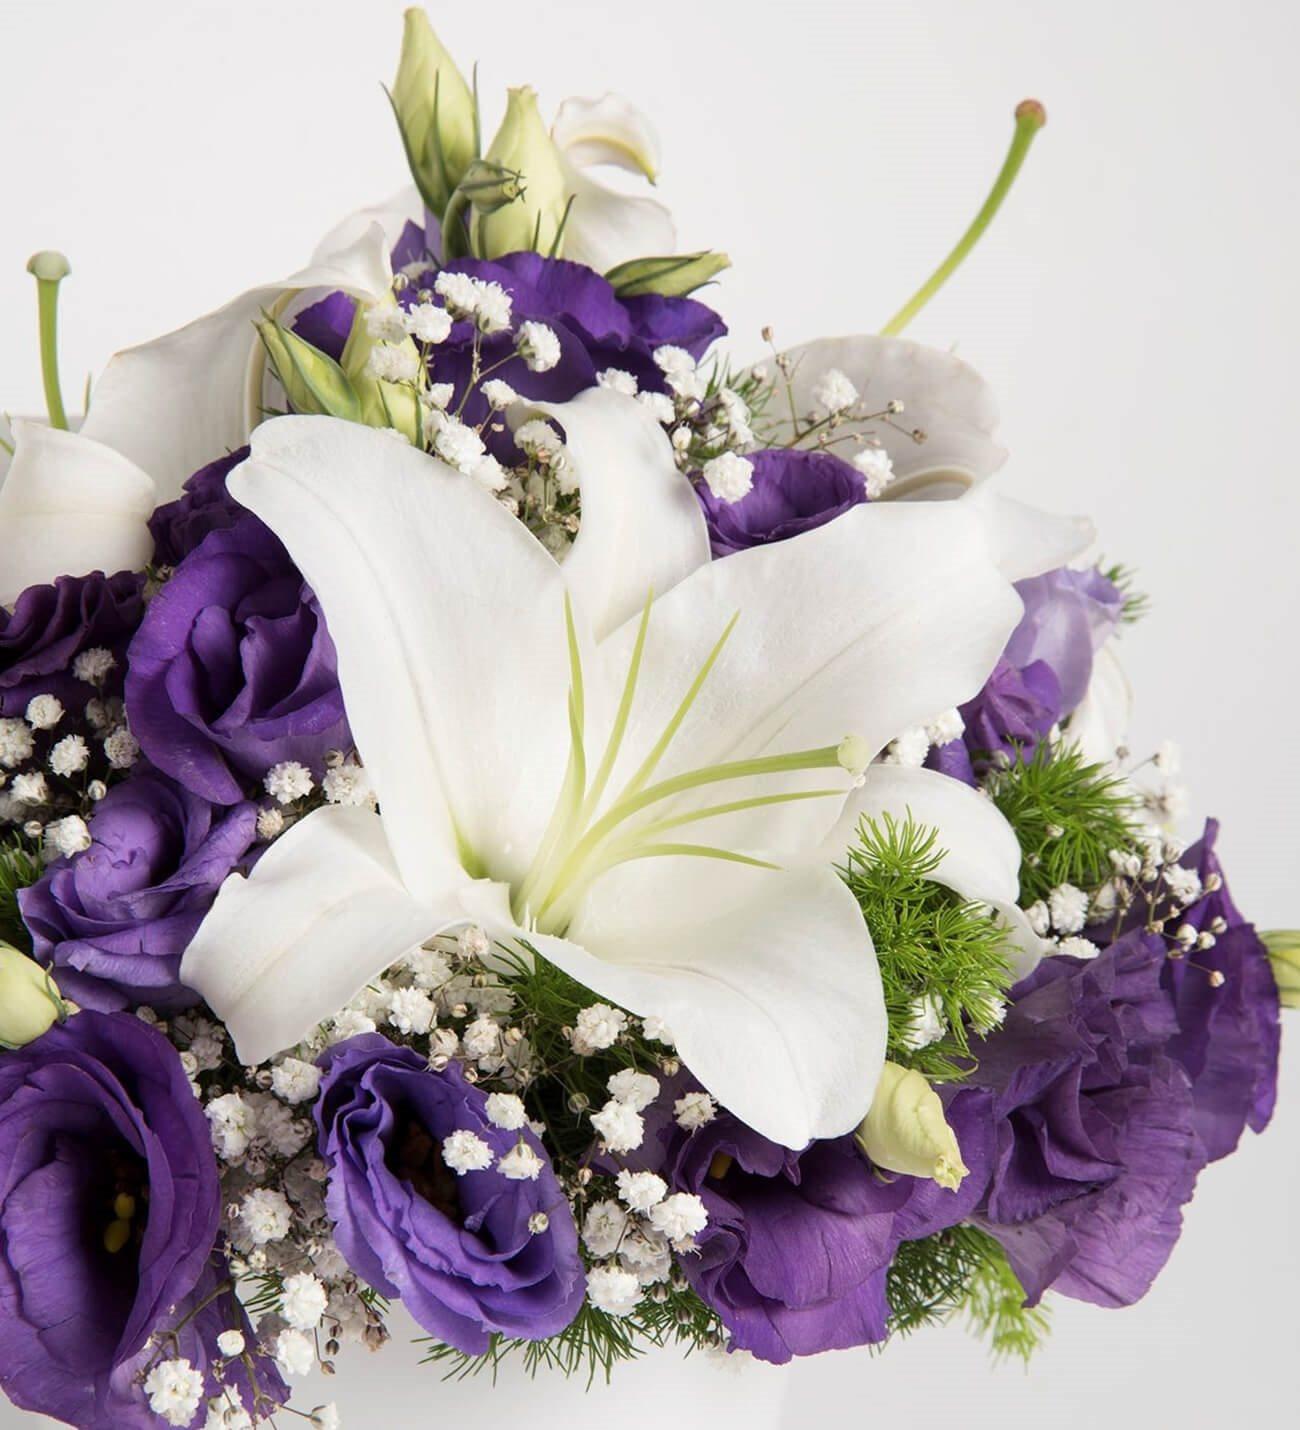 Personalized White Lilies And Purple Lisianthus Arrangement